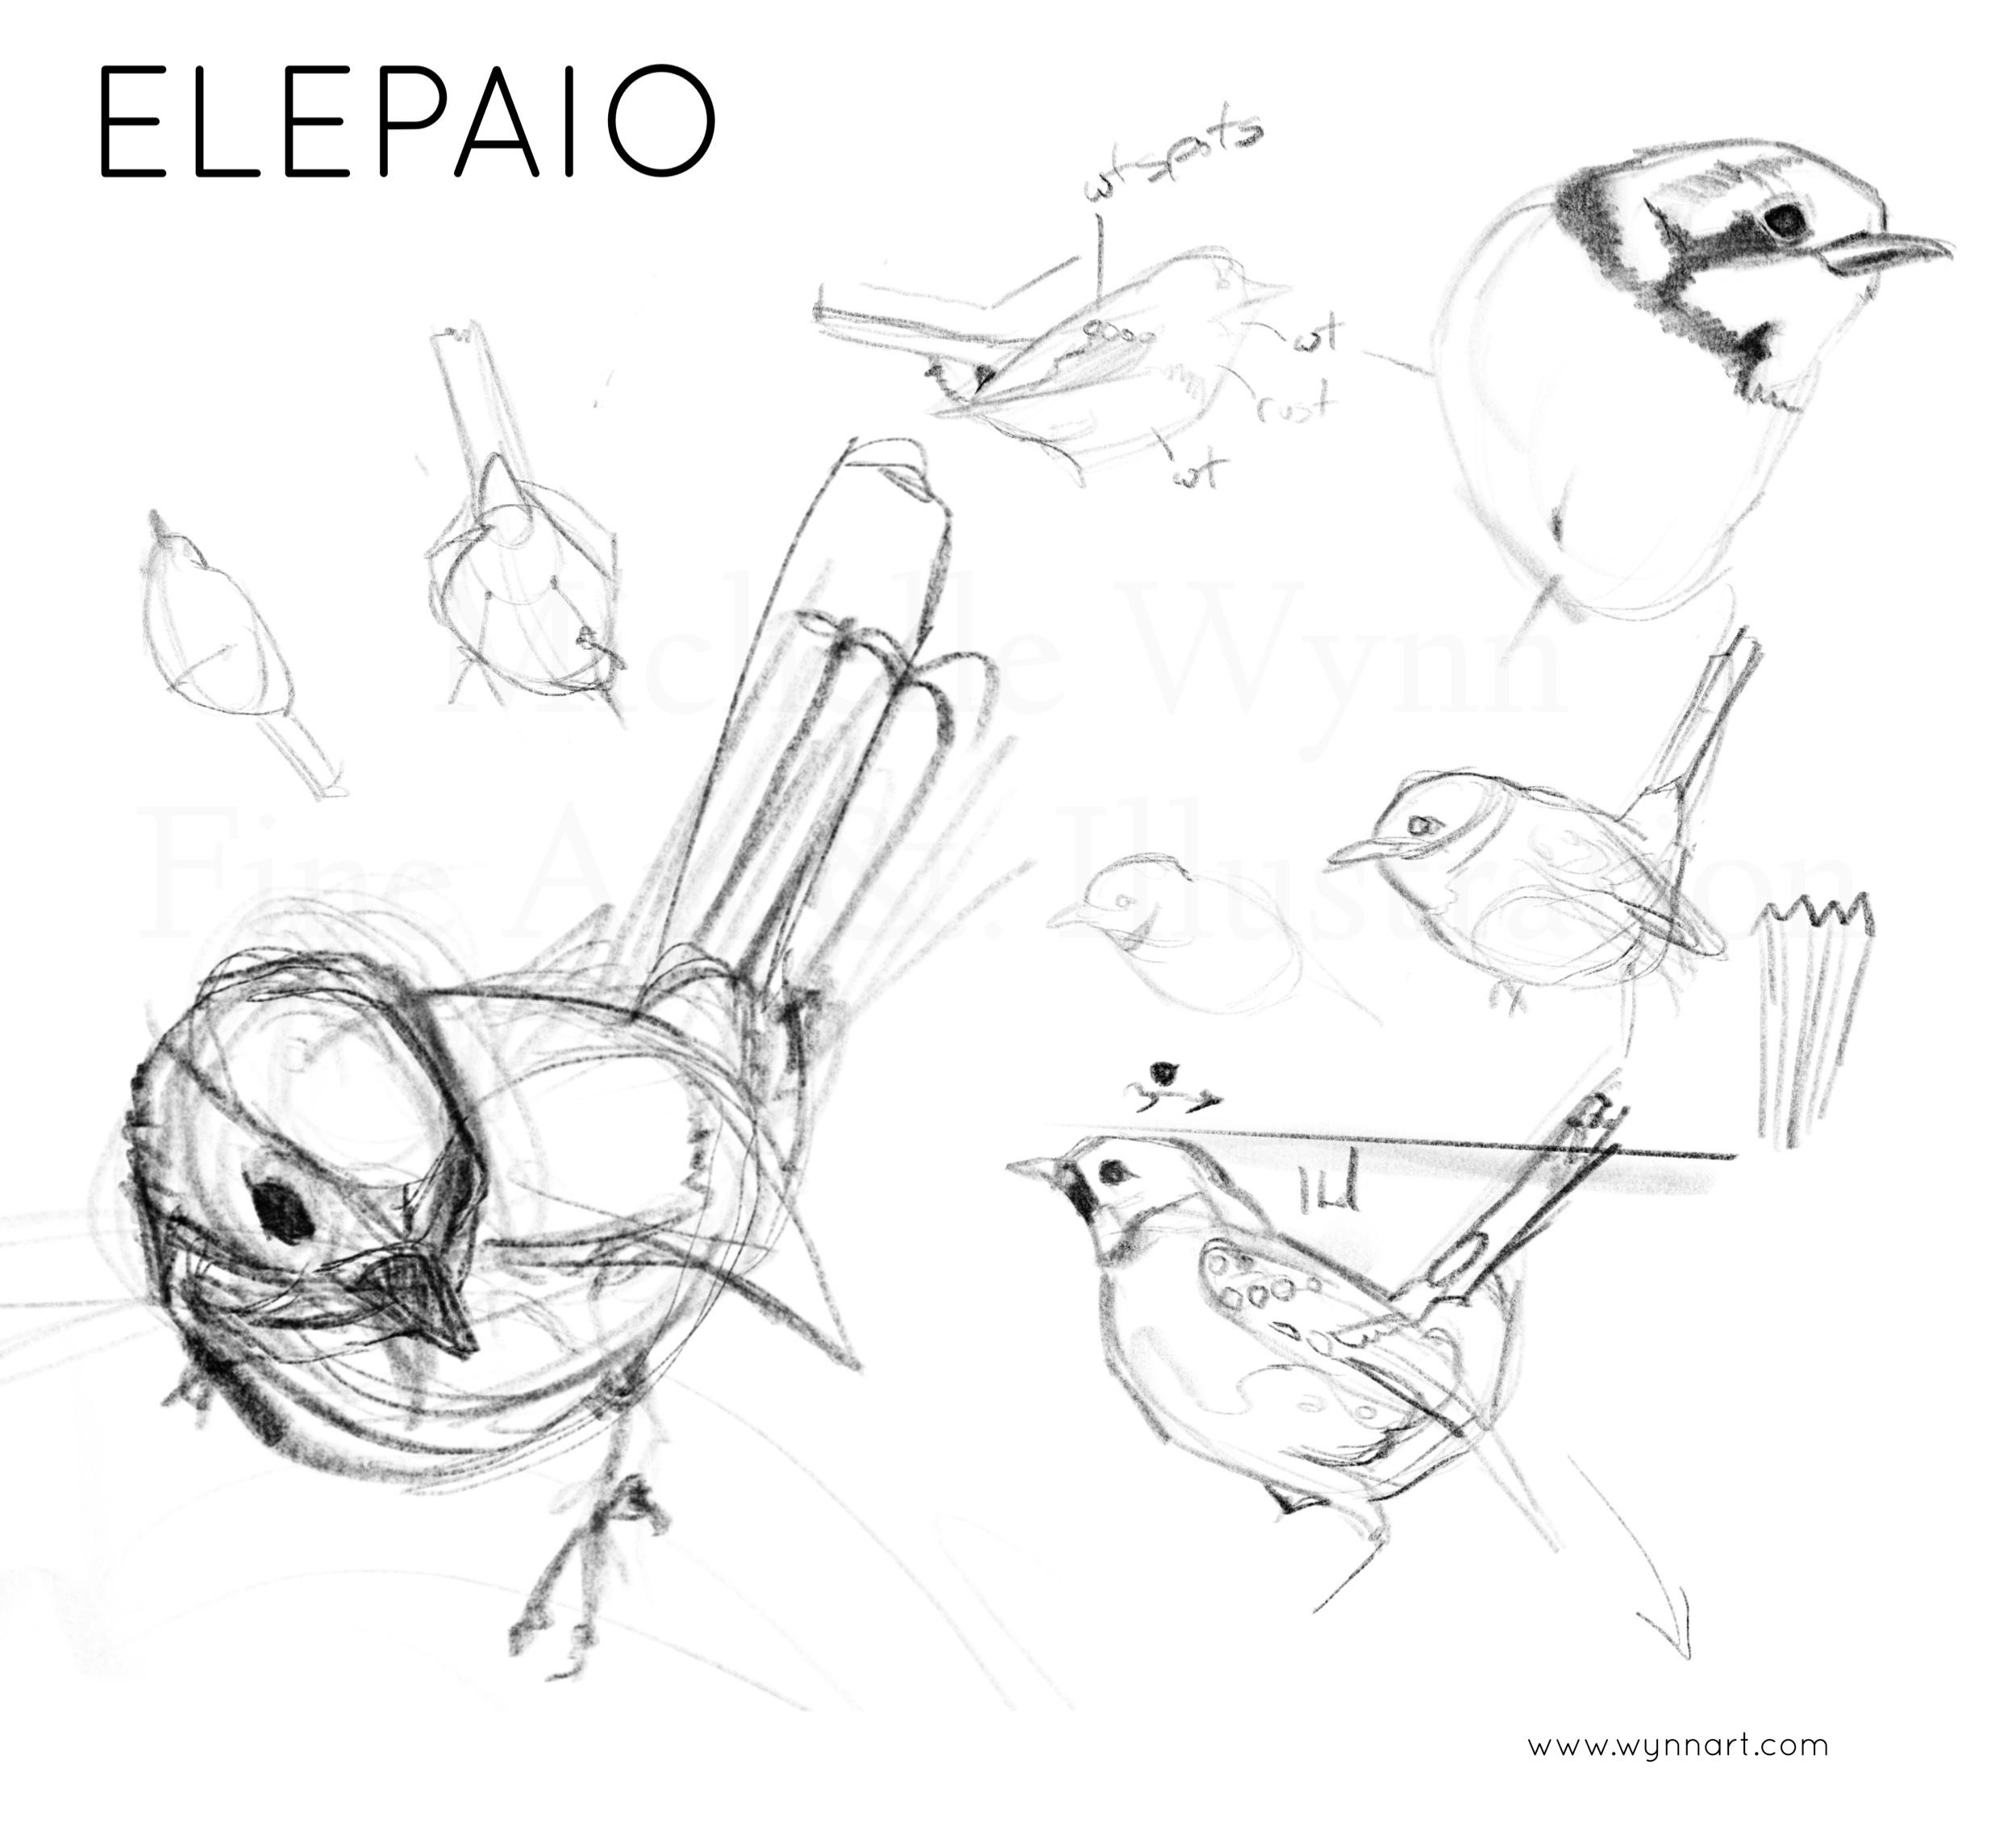 Quick sketches of the elepaio.